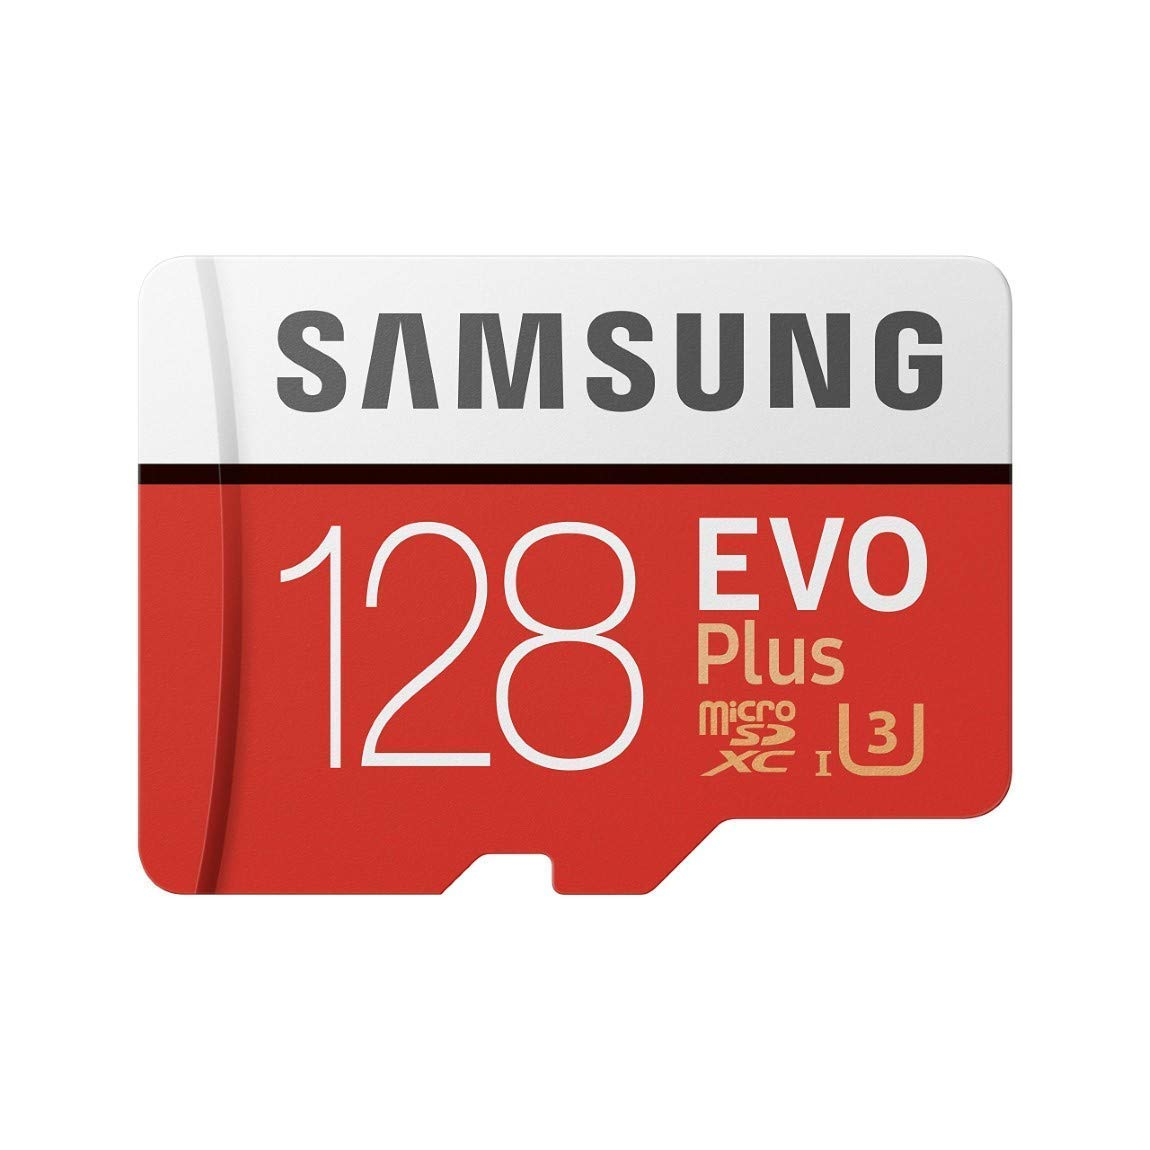 Samsung 128GB MicroSD EVO Plus 100MB/s (U3) Micro SDXC Memory Card w/Adapter (MB-MC128GA) (15 Pack)